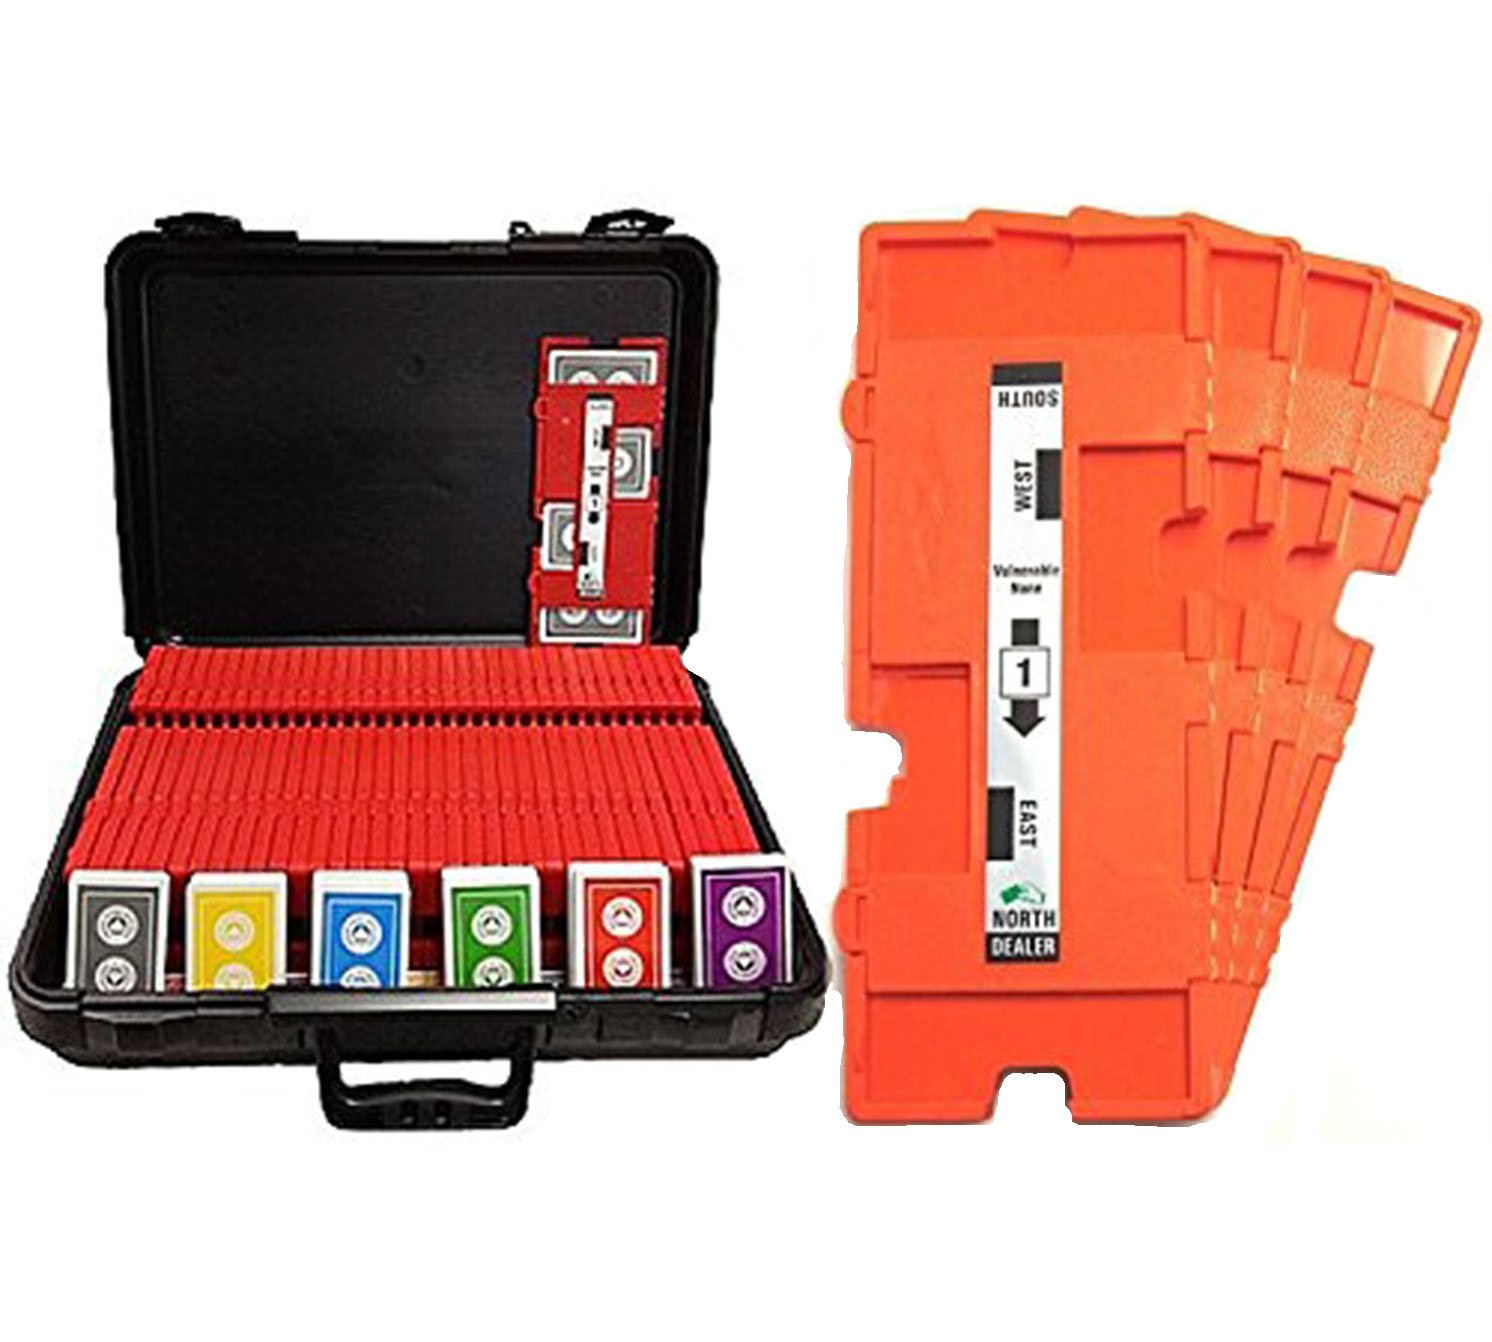 36 Imperial-Plus Duplicate Boards (Orange), 36 Decks ACBL Cards & Carrying Case